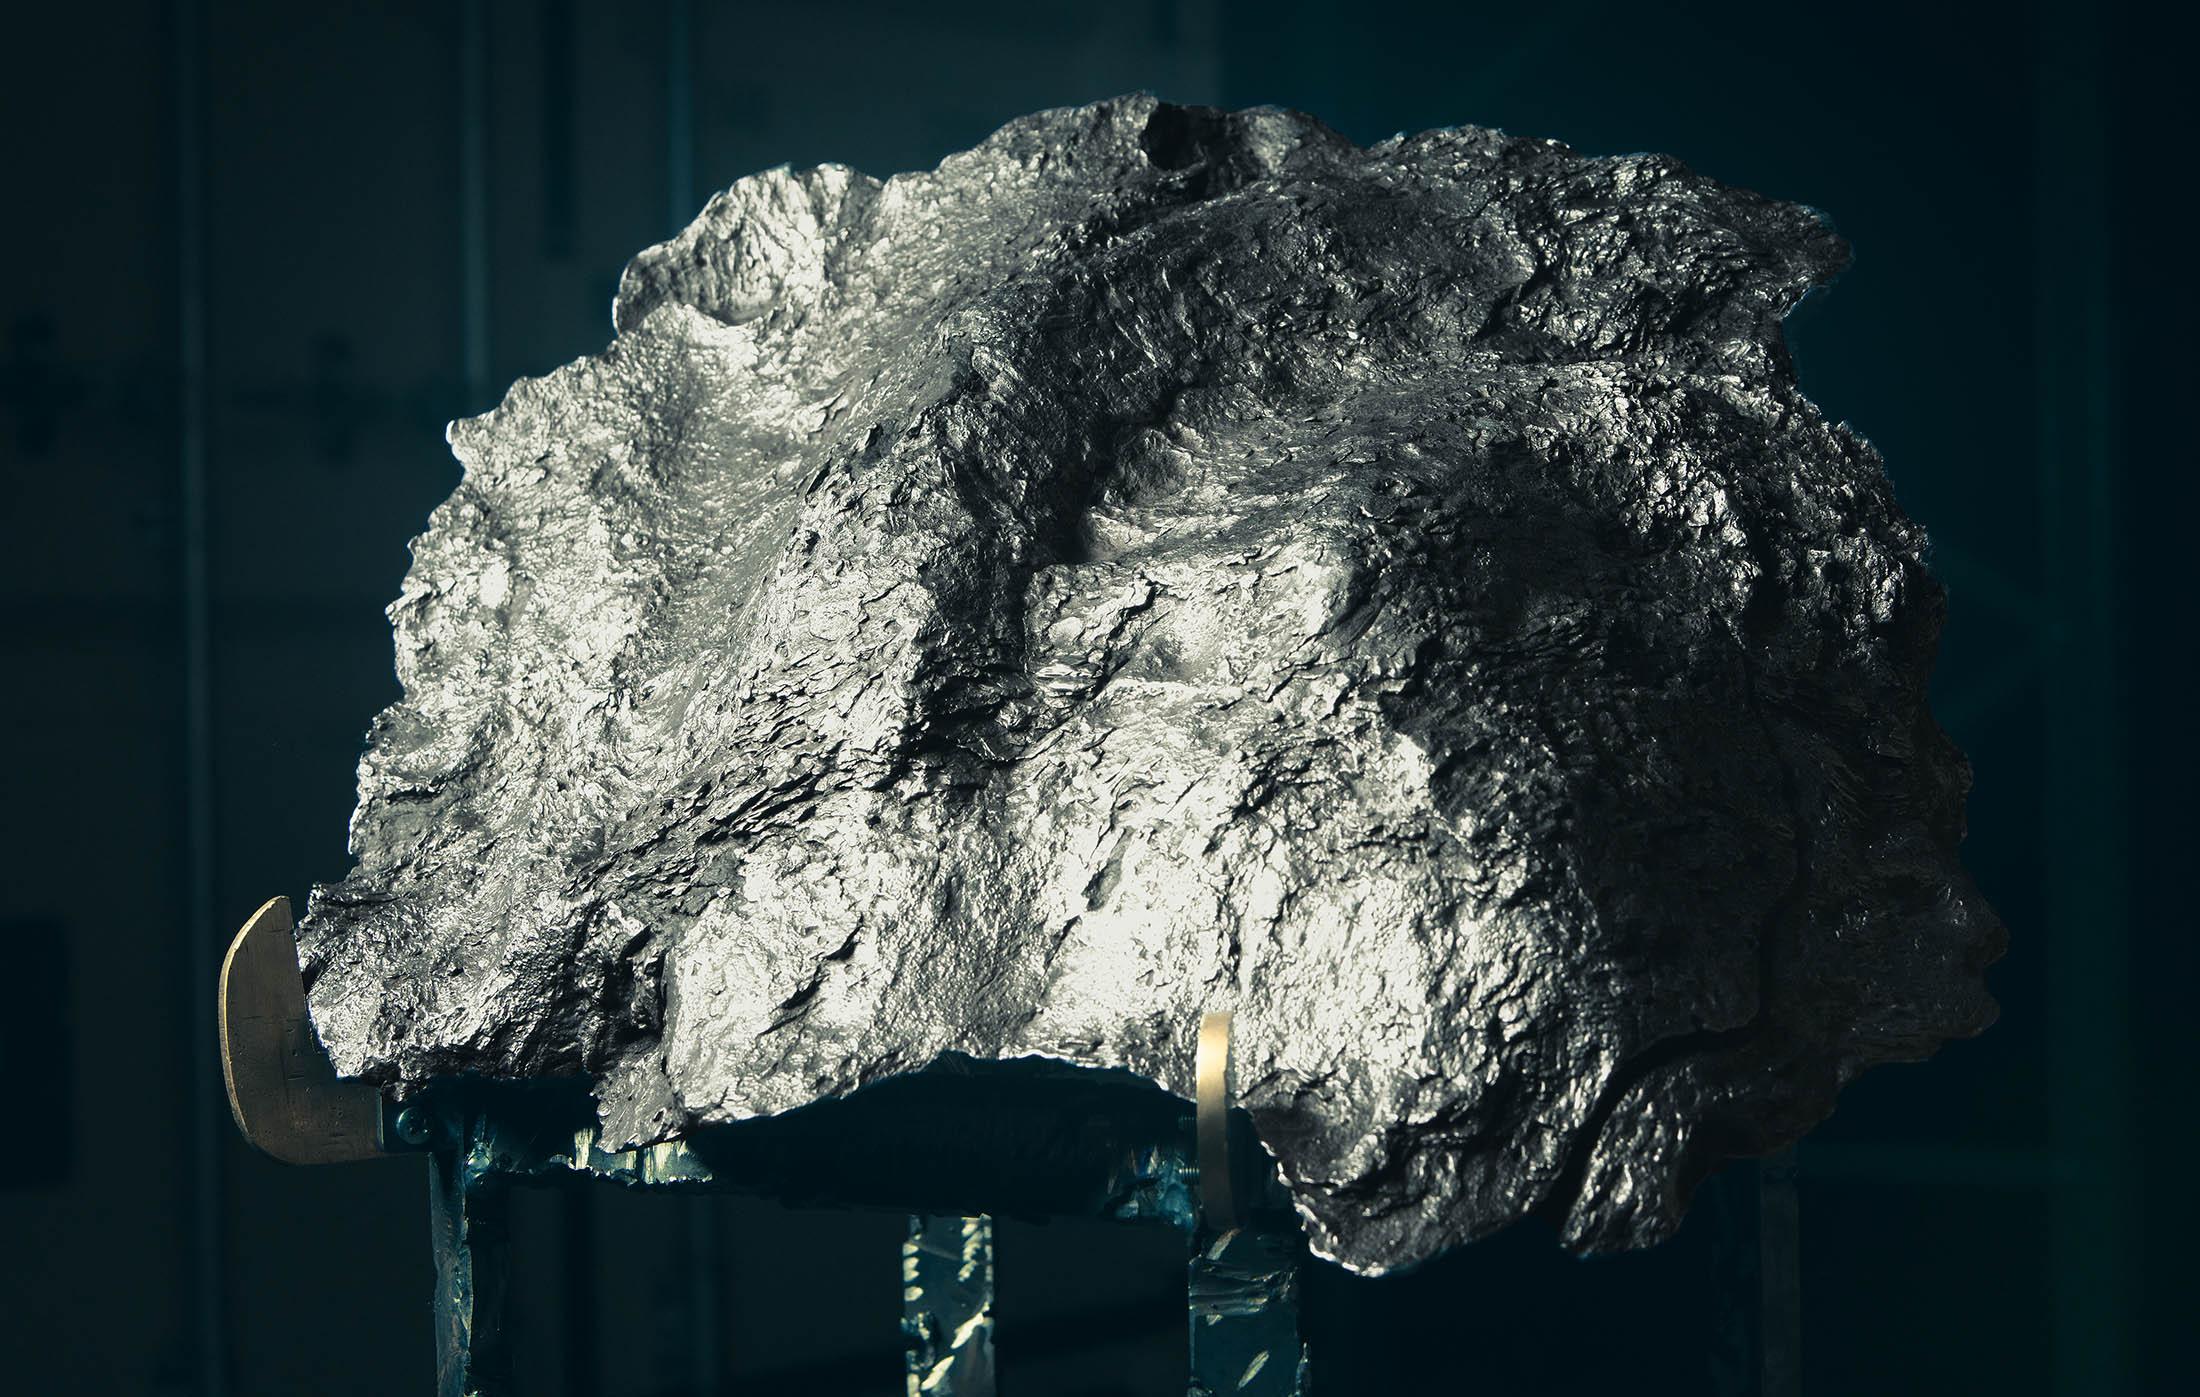 Large Campo del Cielo Iron Meteorite